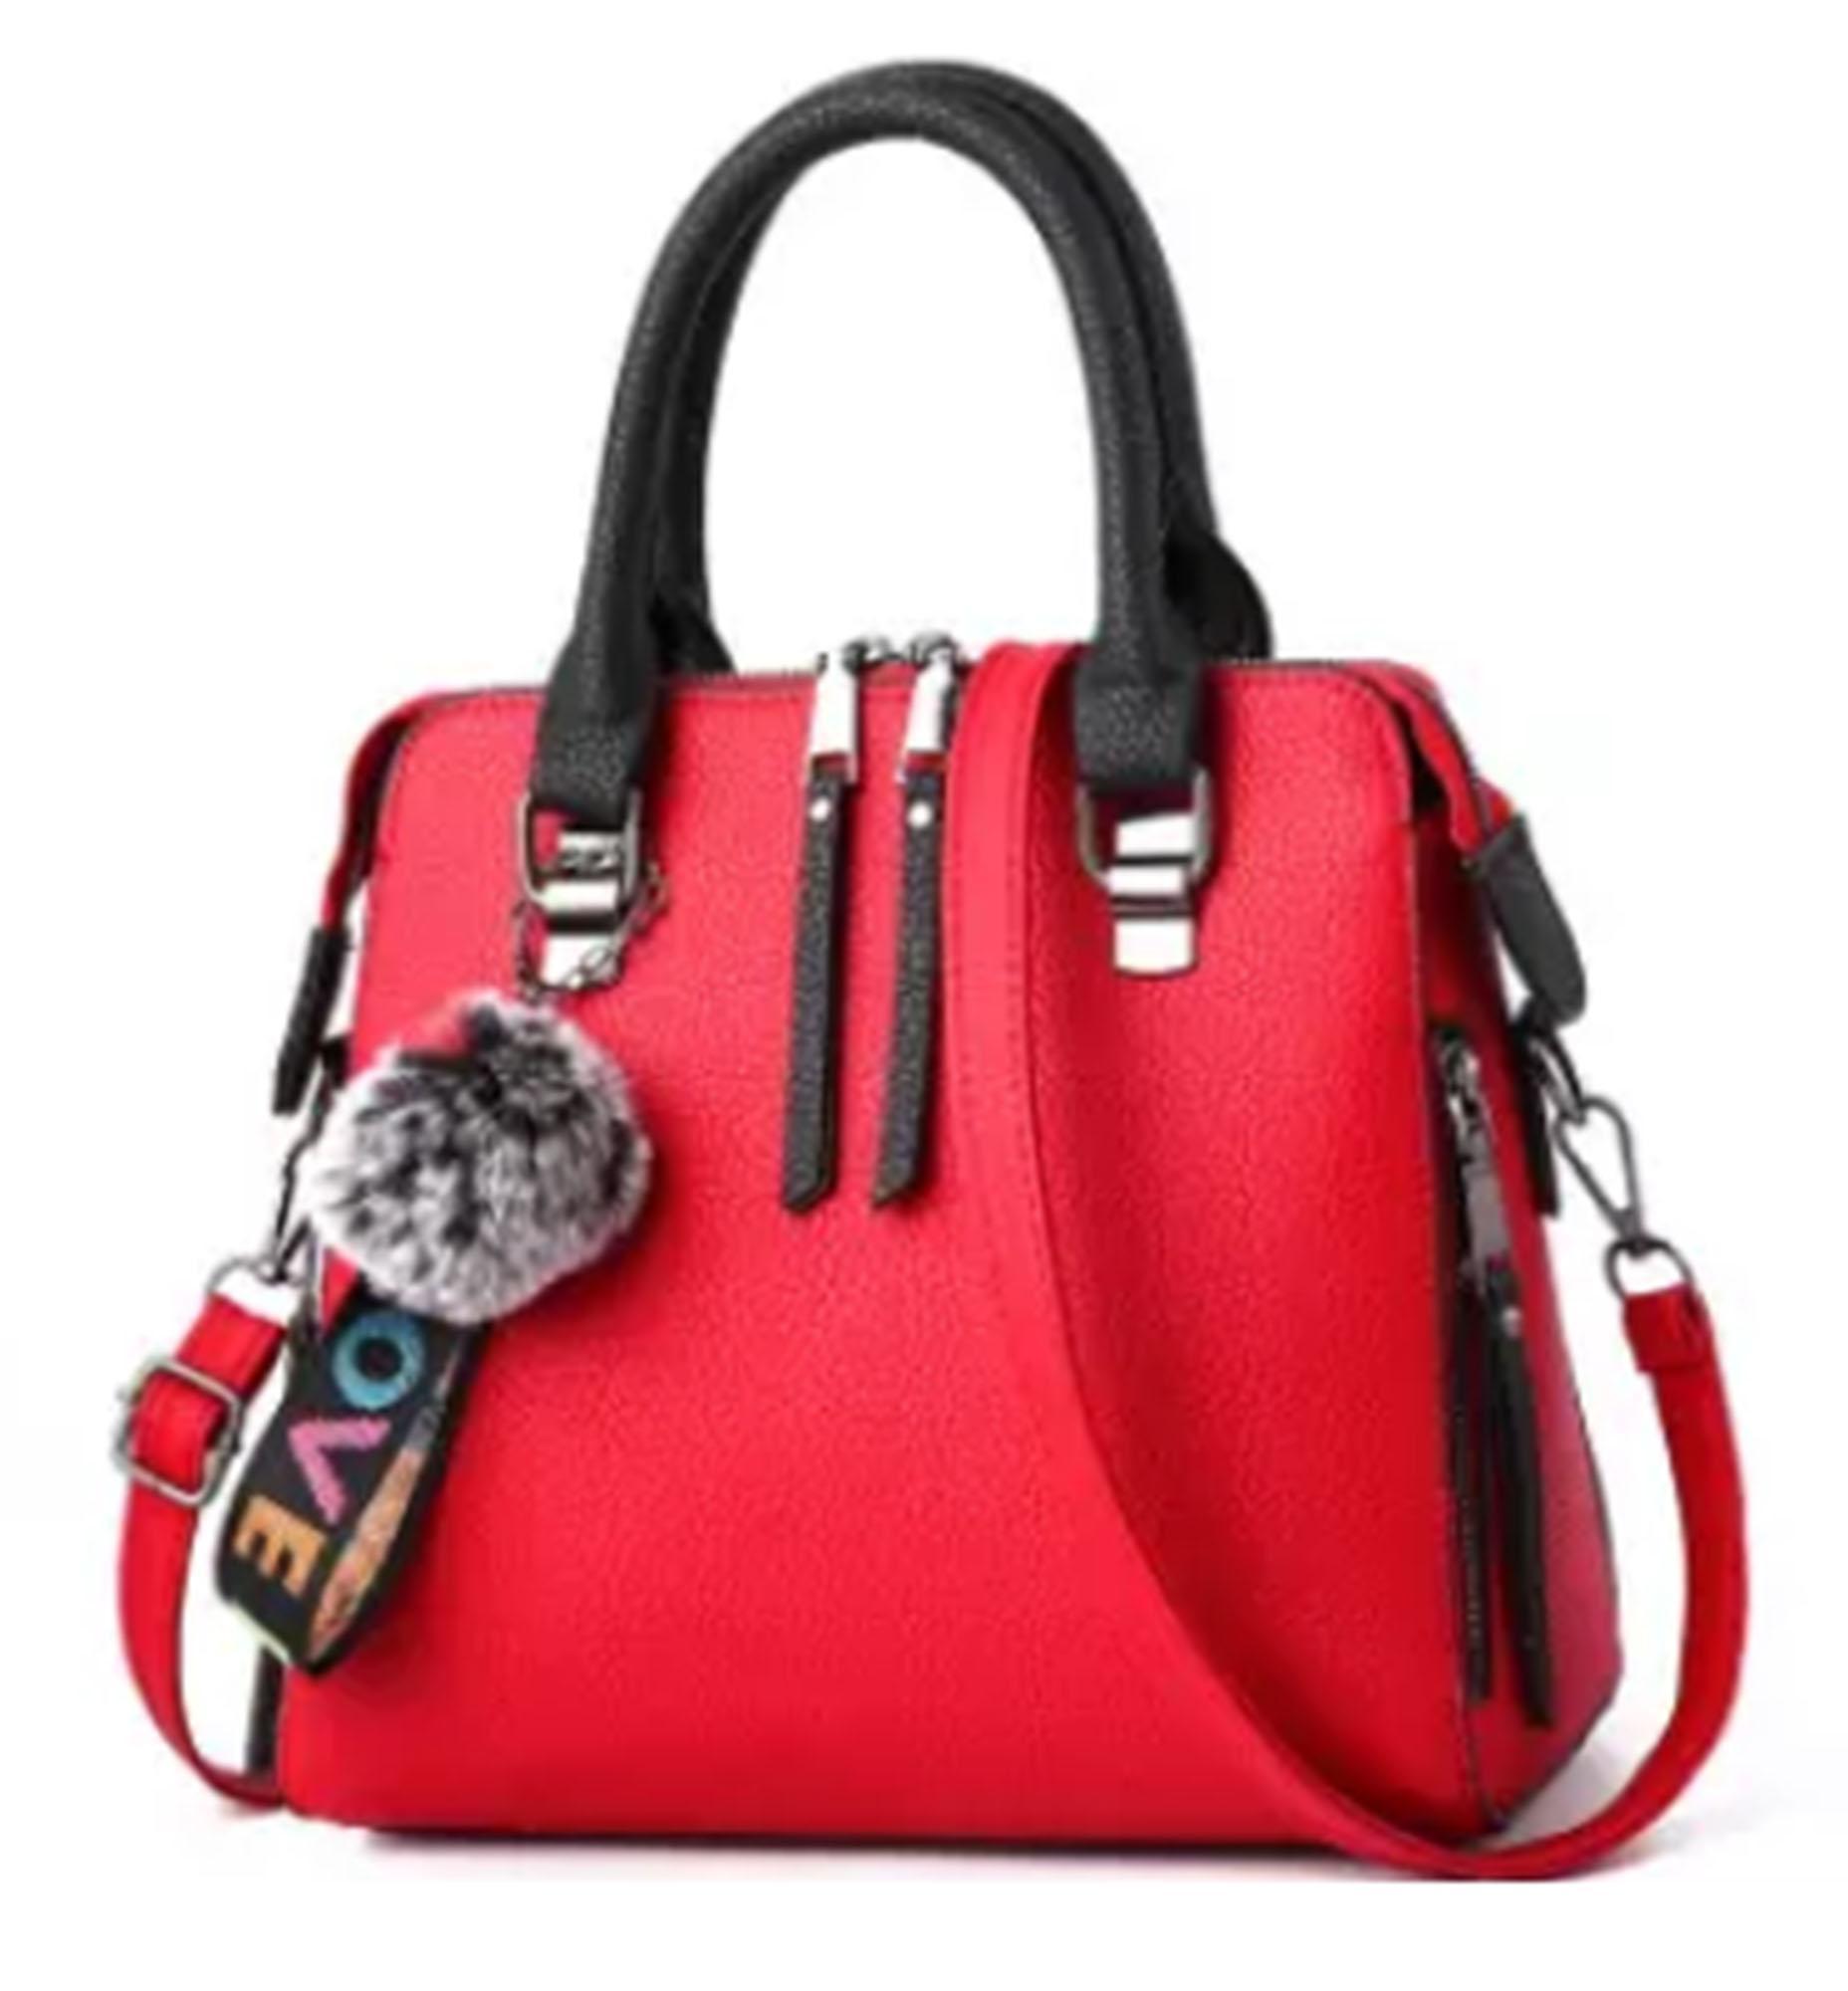 f9a81c0f153c Women Bags - Buy Women Bags at Best Price in Srilanka